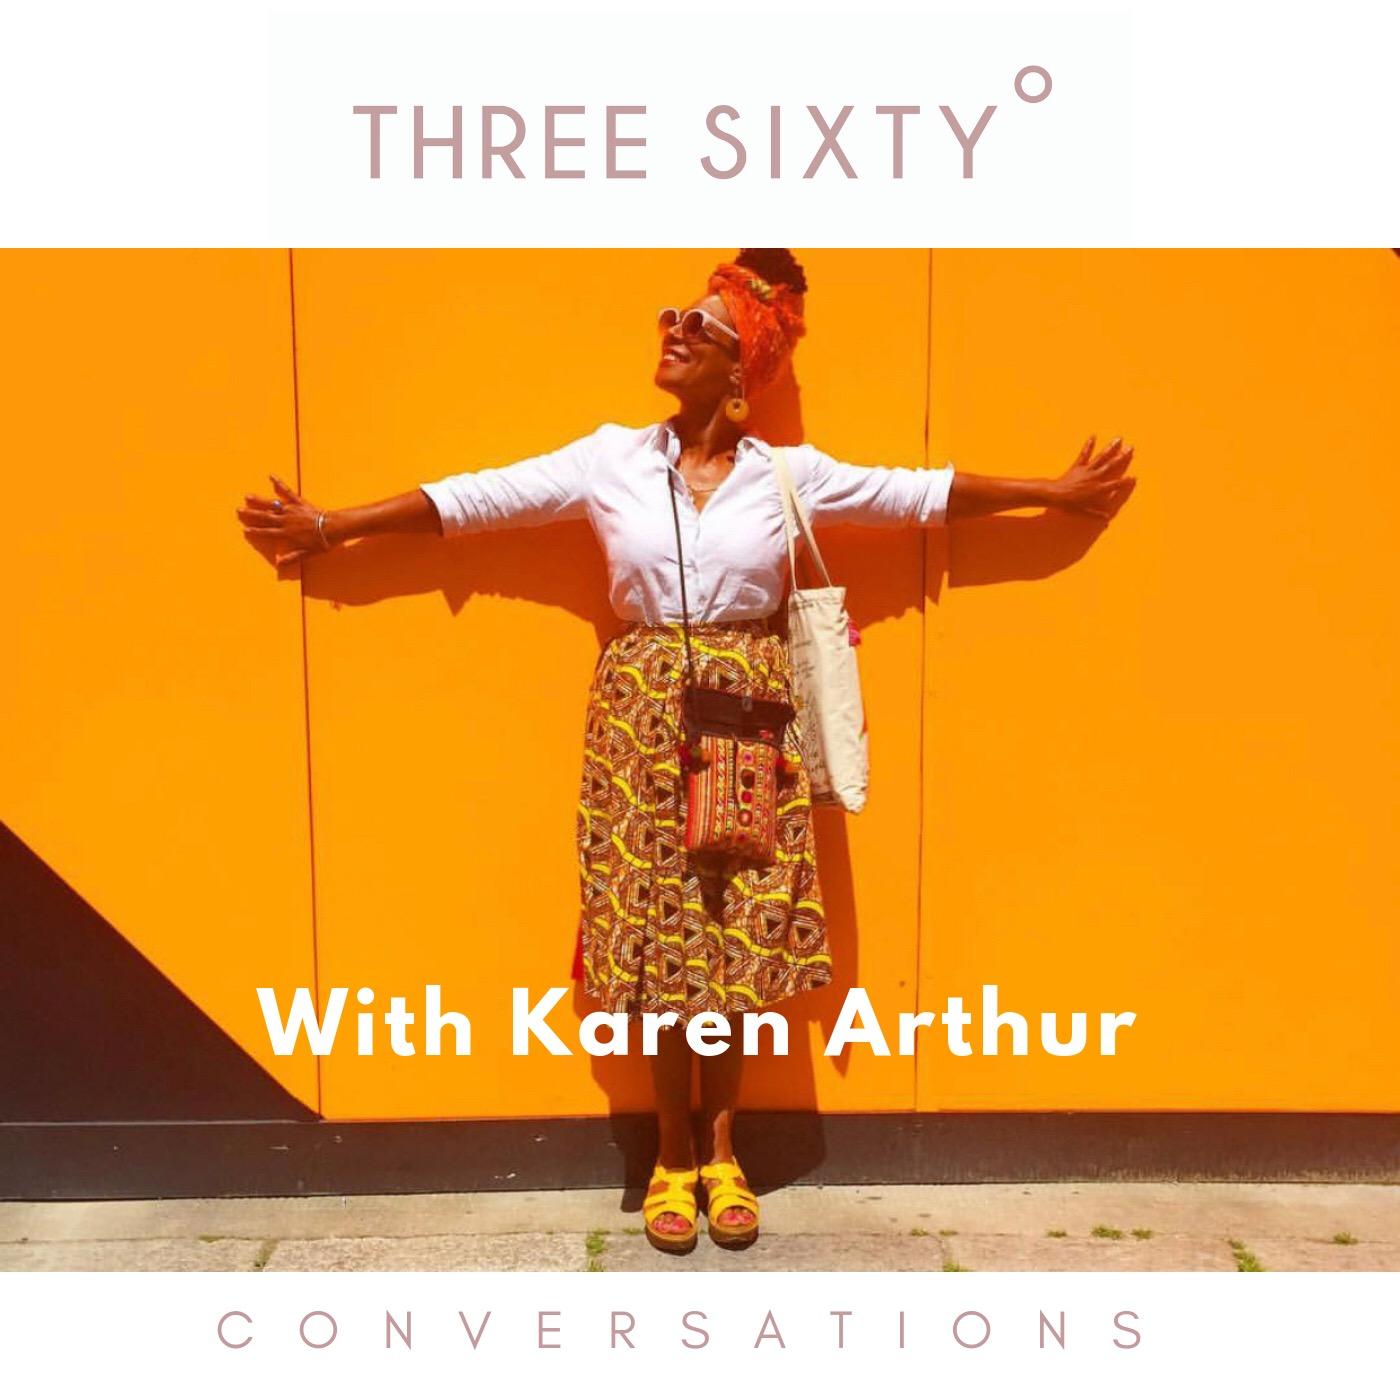 karen arthur, redeskin uk, tamu thomas, live three sixty, black girl magic, Candice Brathwaite, sharmadean Reid, Freddie Harrell, wellness, menopause, fashionable pan